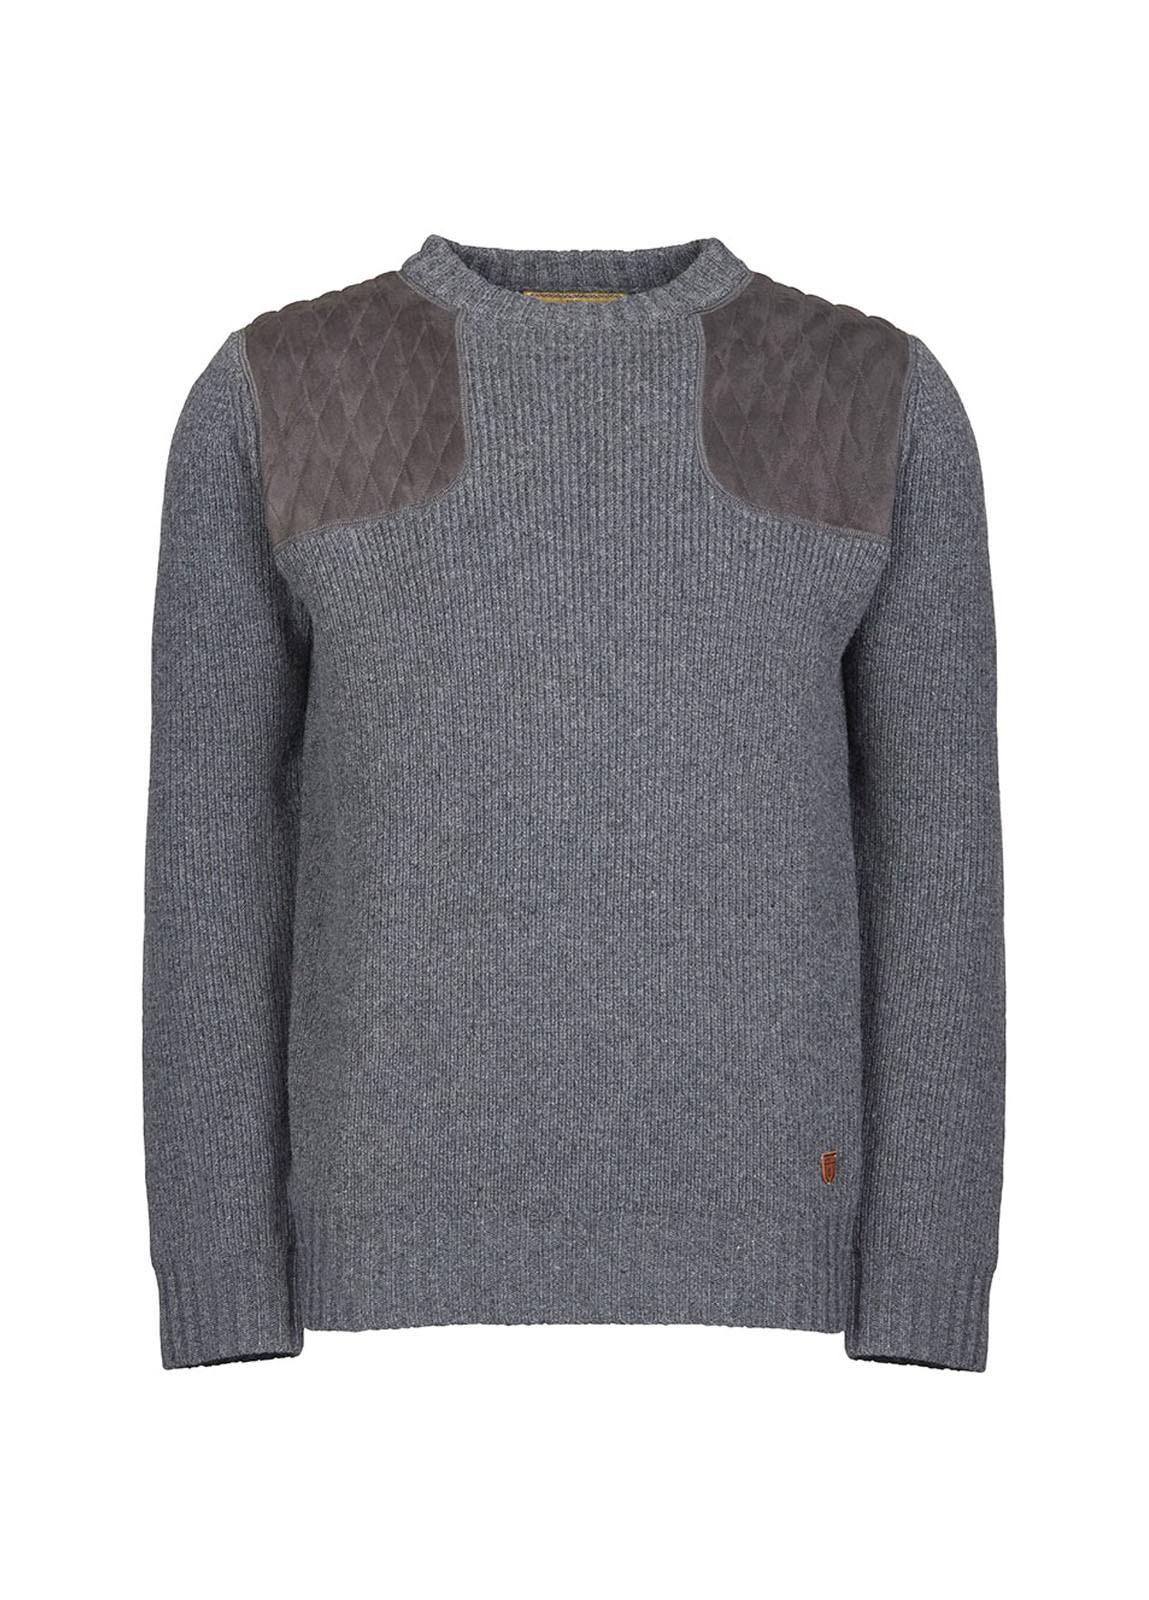 Dubarry_ Mulligan Men's Sweater - Graphite_Image_2